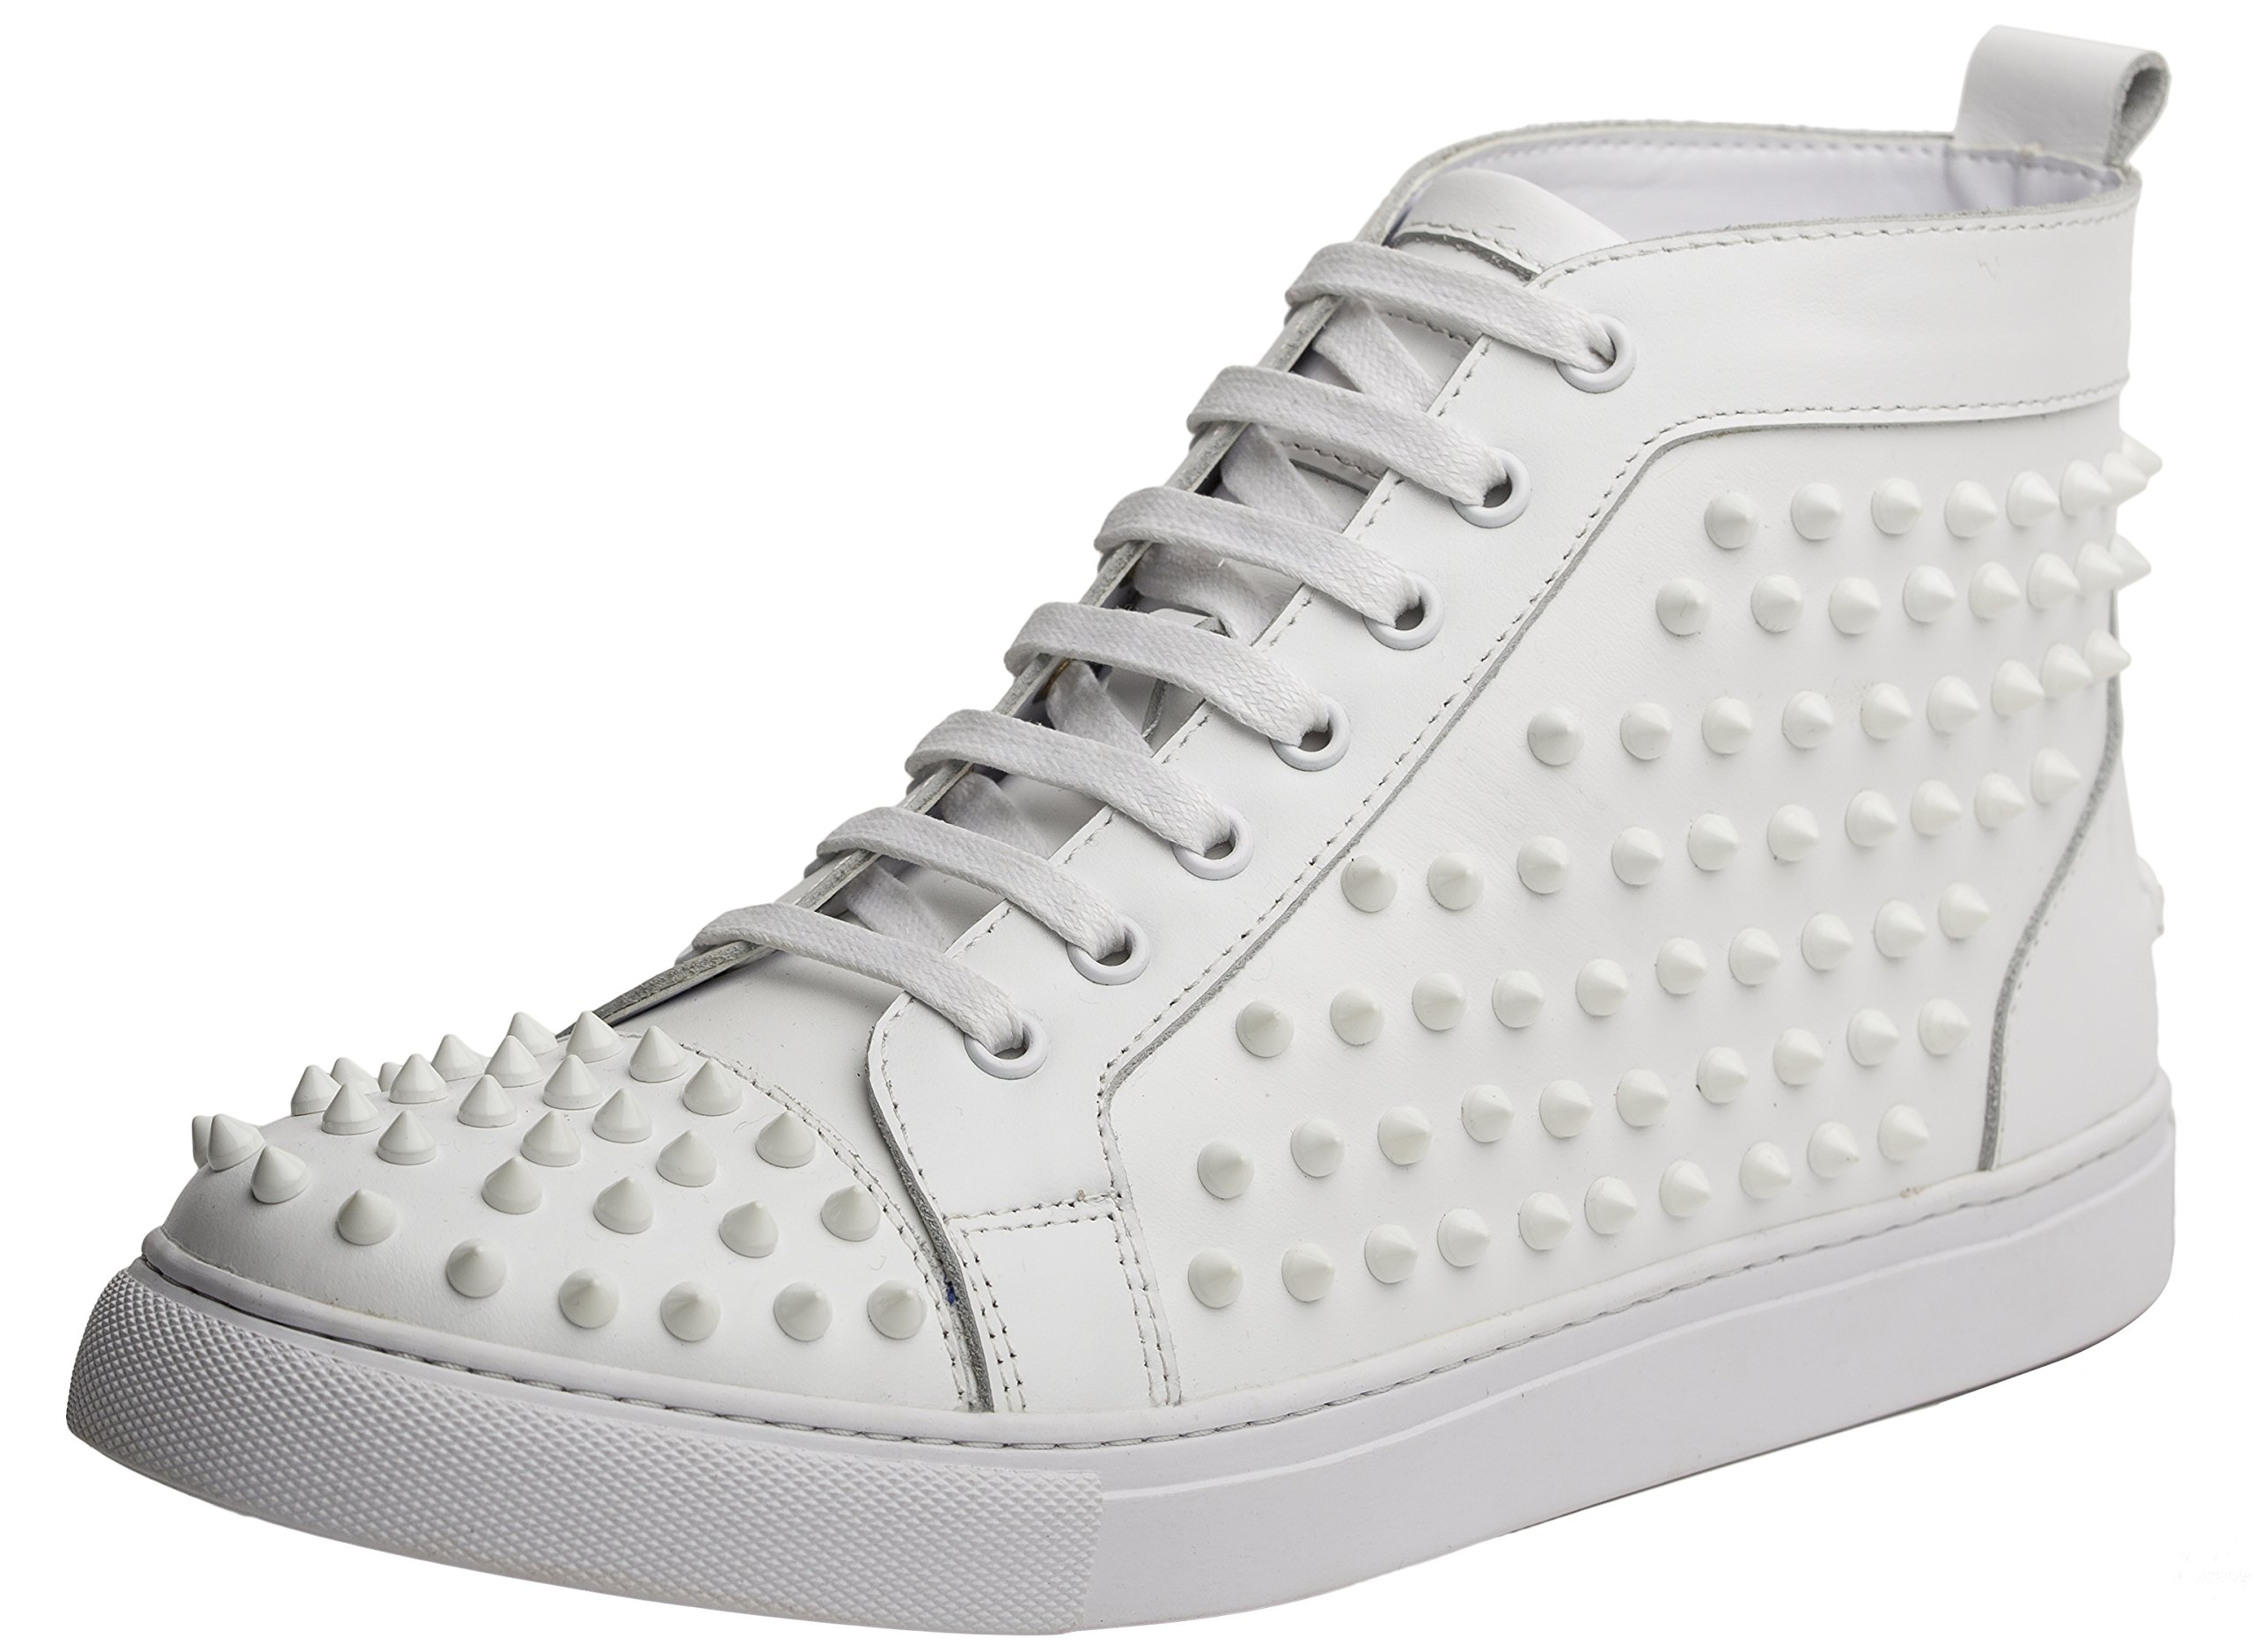 J75 by Jump Men's Zoo High-Top Fashion Sneaker White 9 D US by J75